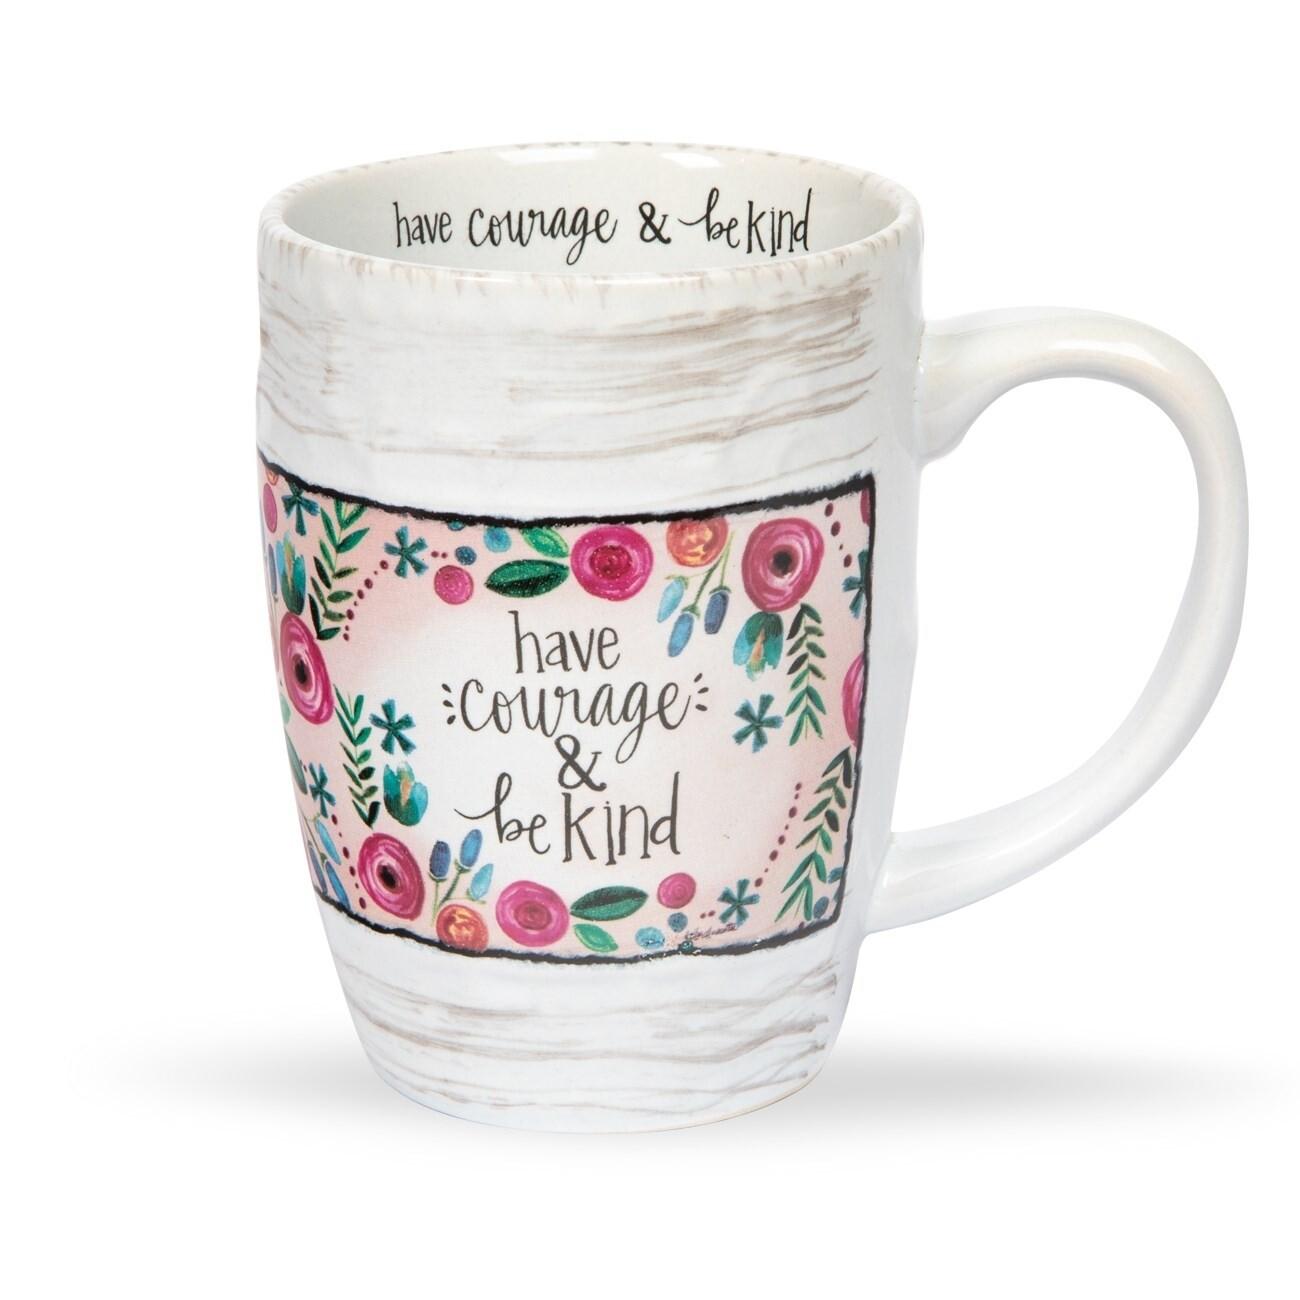 Brownlow Floral Mug - Have Courage